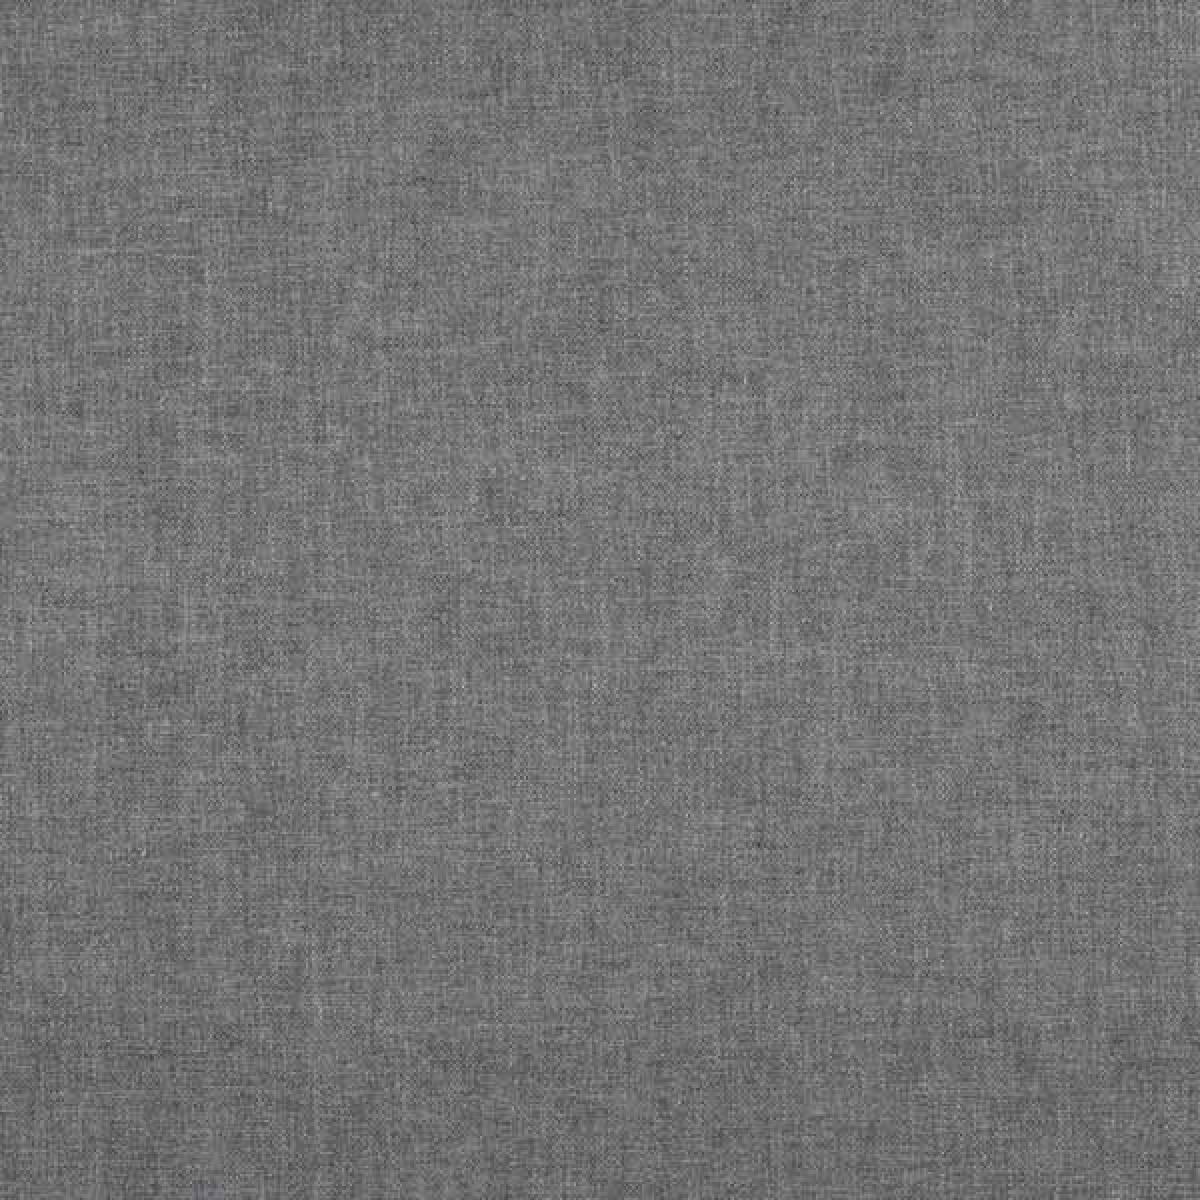 Chambray Fabric Charcoal Chambraycharcoal Warwick